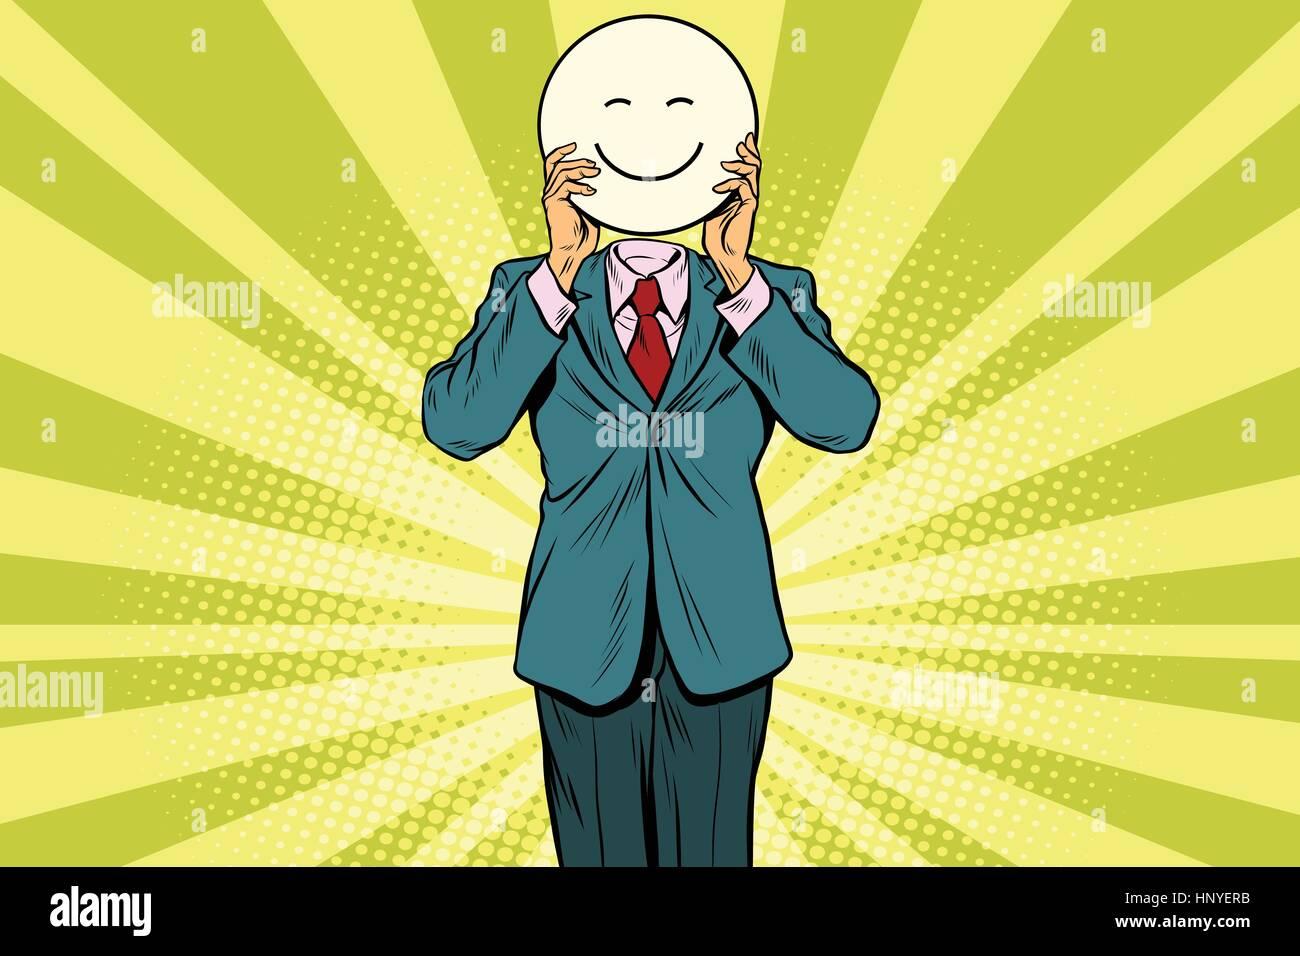 Joy smile. Man smiley Emoji face. Vintage pop art retro comic book vector illustration - Stock Image